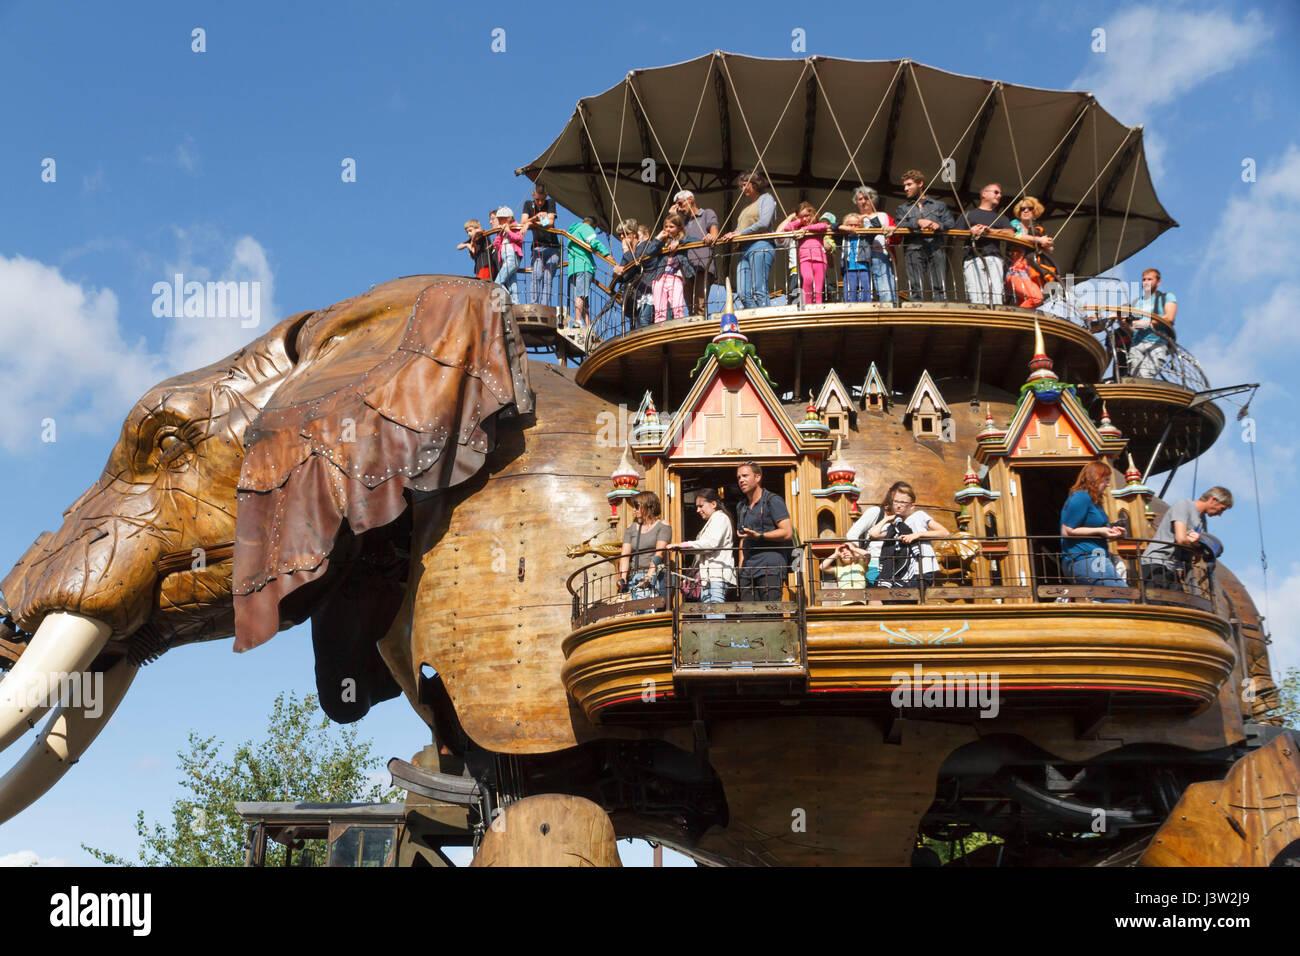 The Great Elephant at Les Machines de l'île, Nantes, France. Created by François Delarozière and Pierre Orefice's Stock Photo